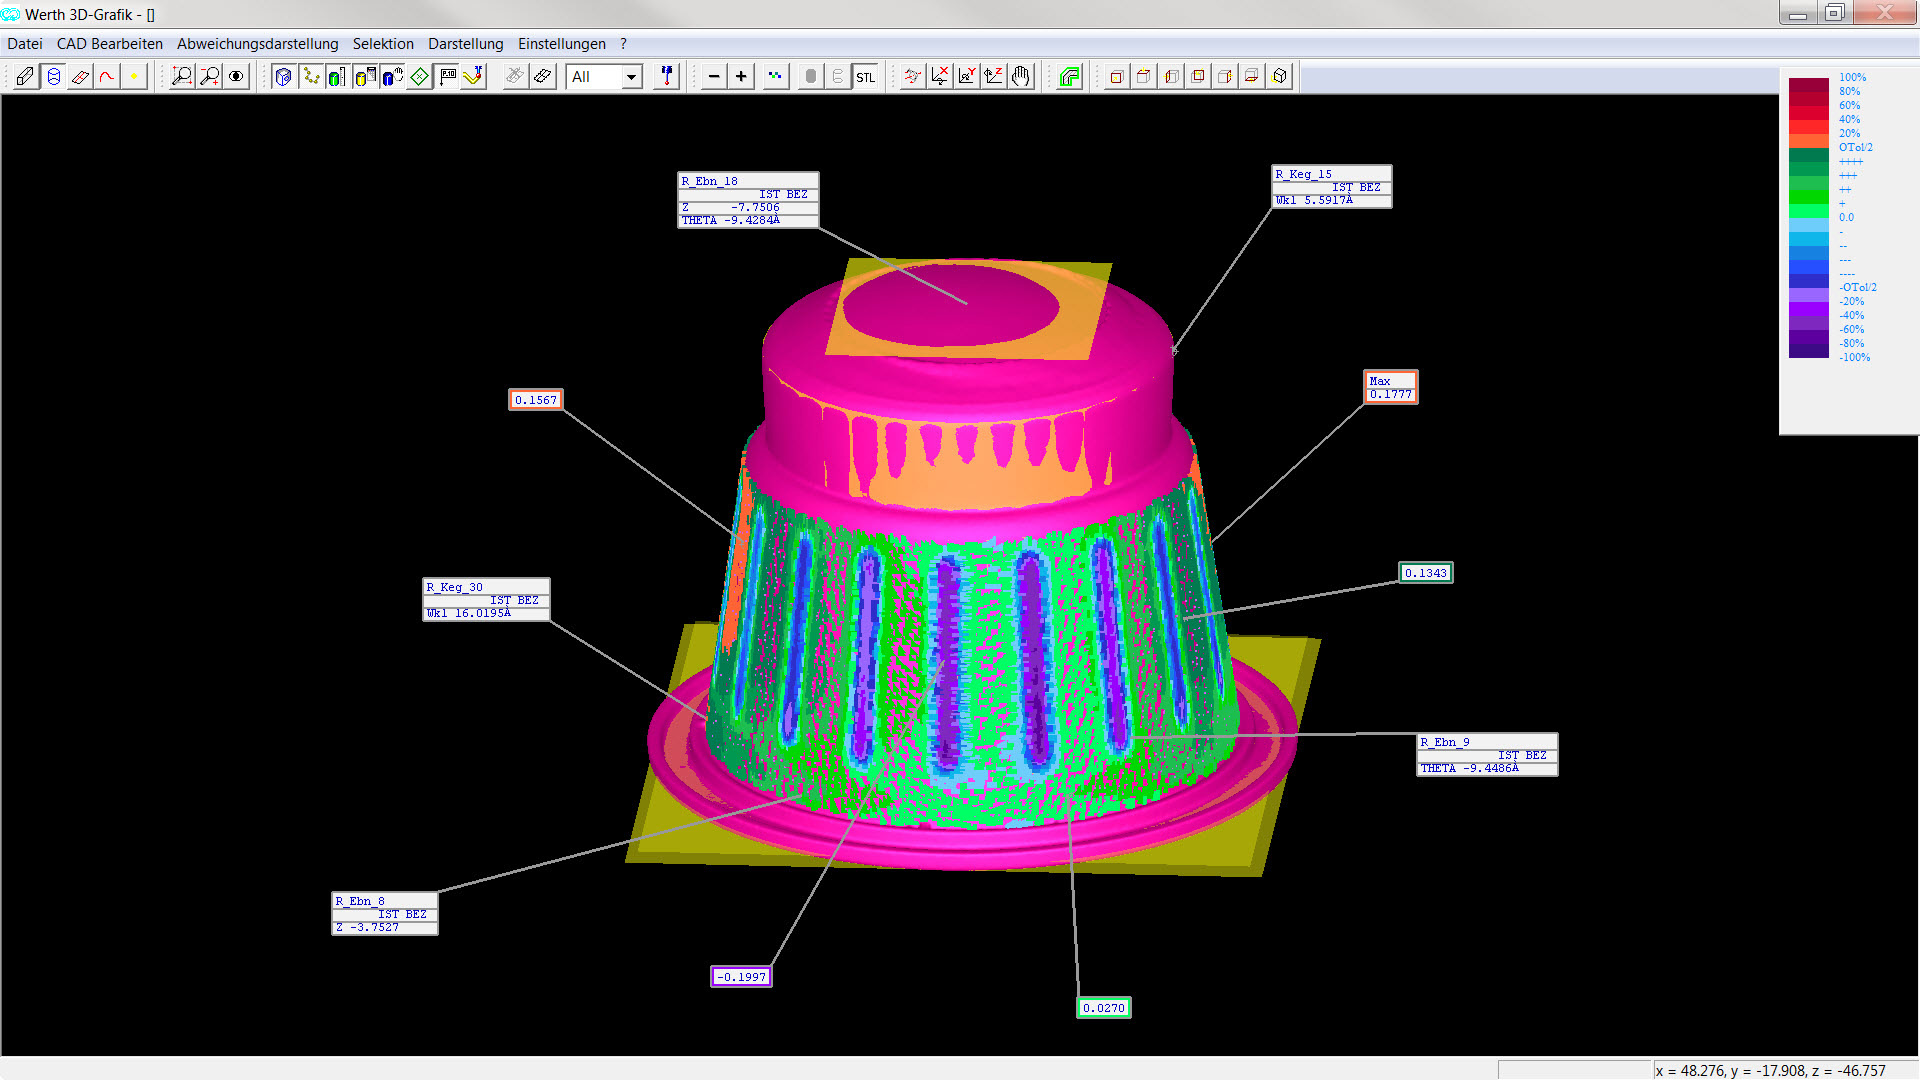 Kompaktes KMG mit CT-Sensor